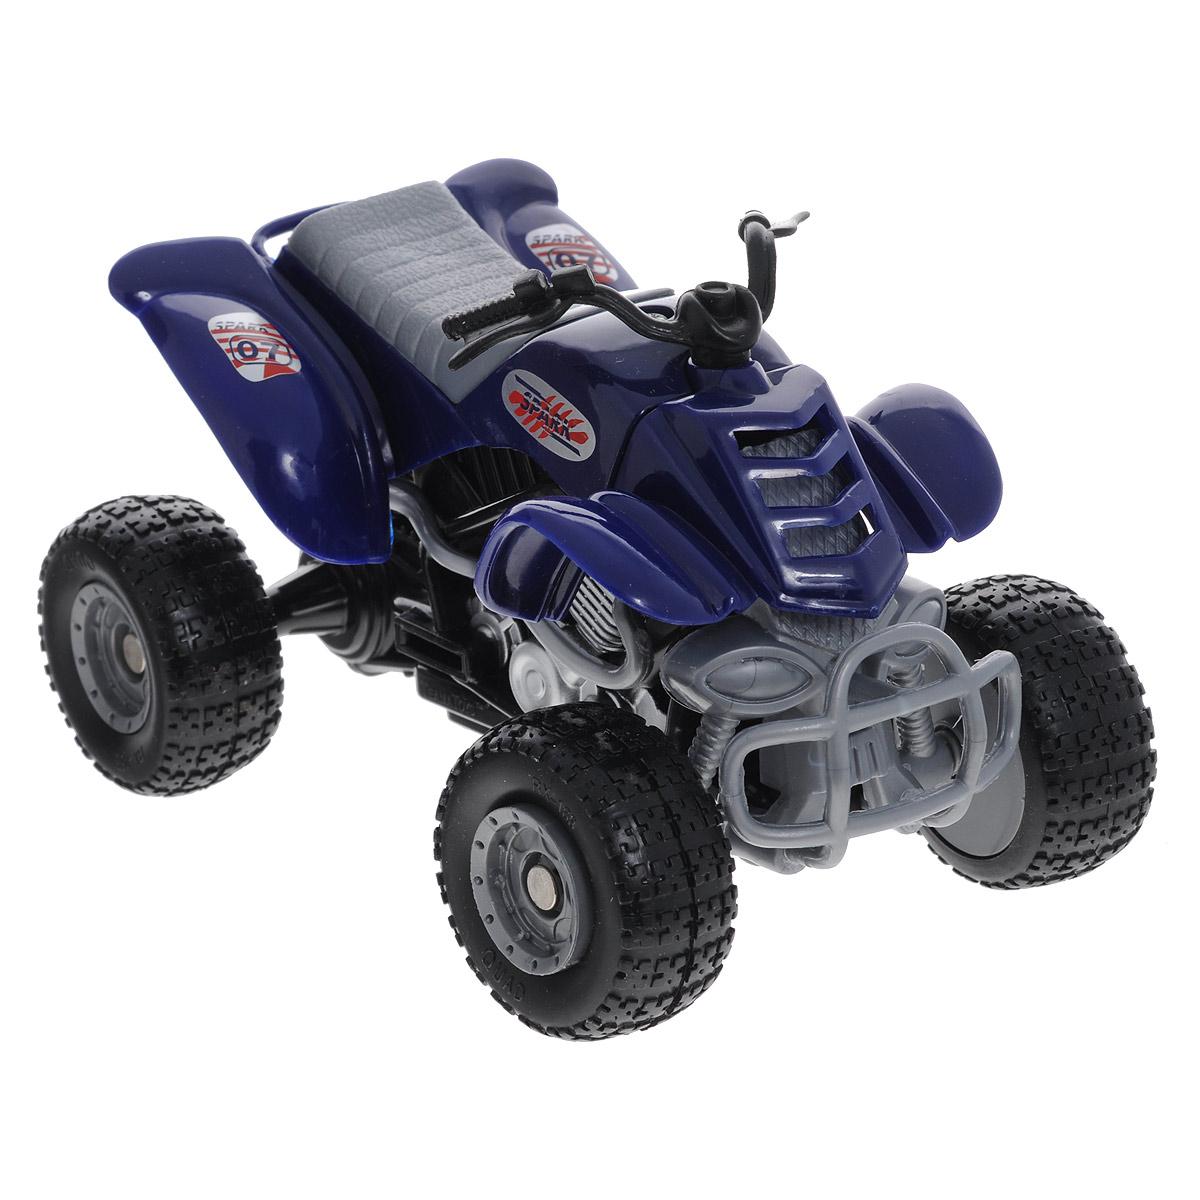 Autotime Коллекционная модель  Мотоцикл Quadrobike Monster , цвет: синий - Электромобили